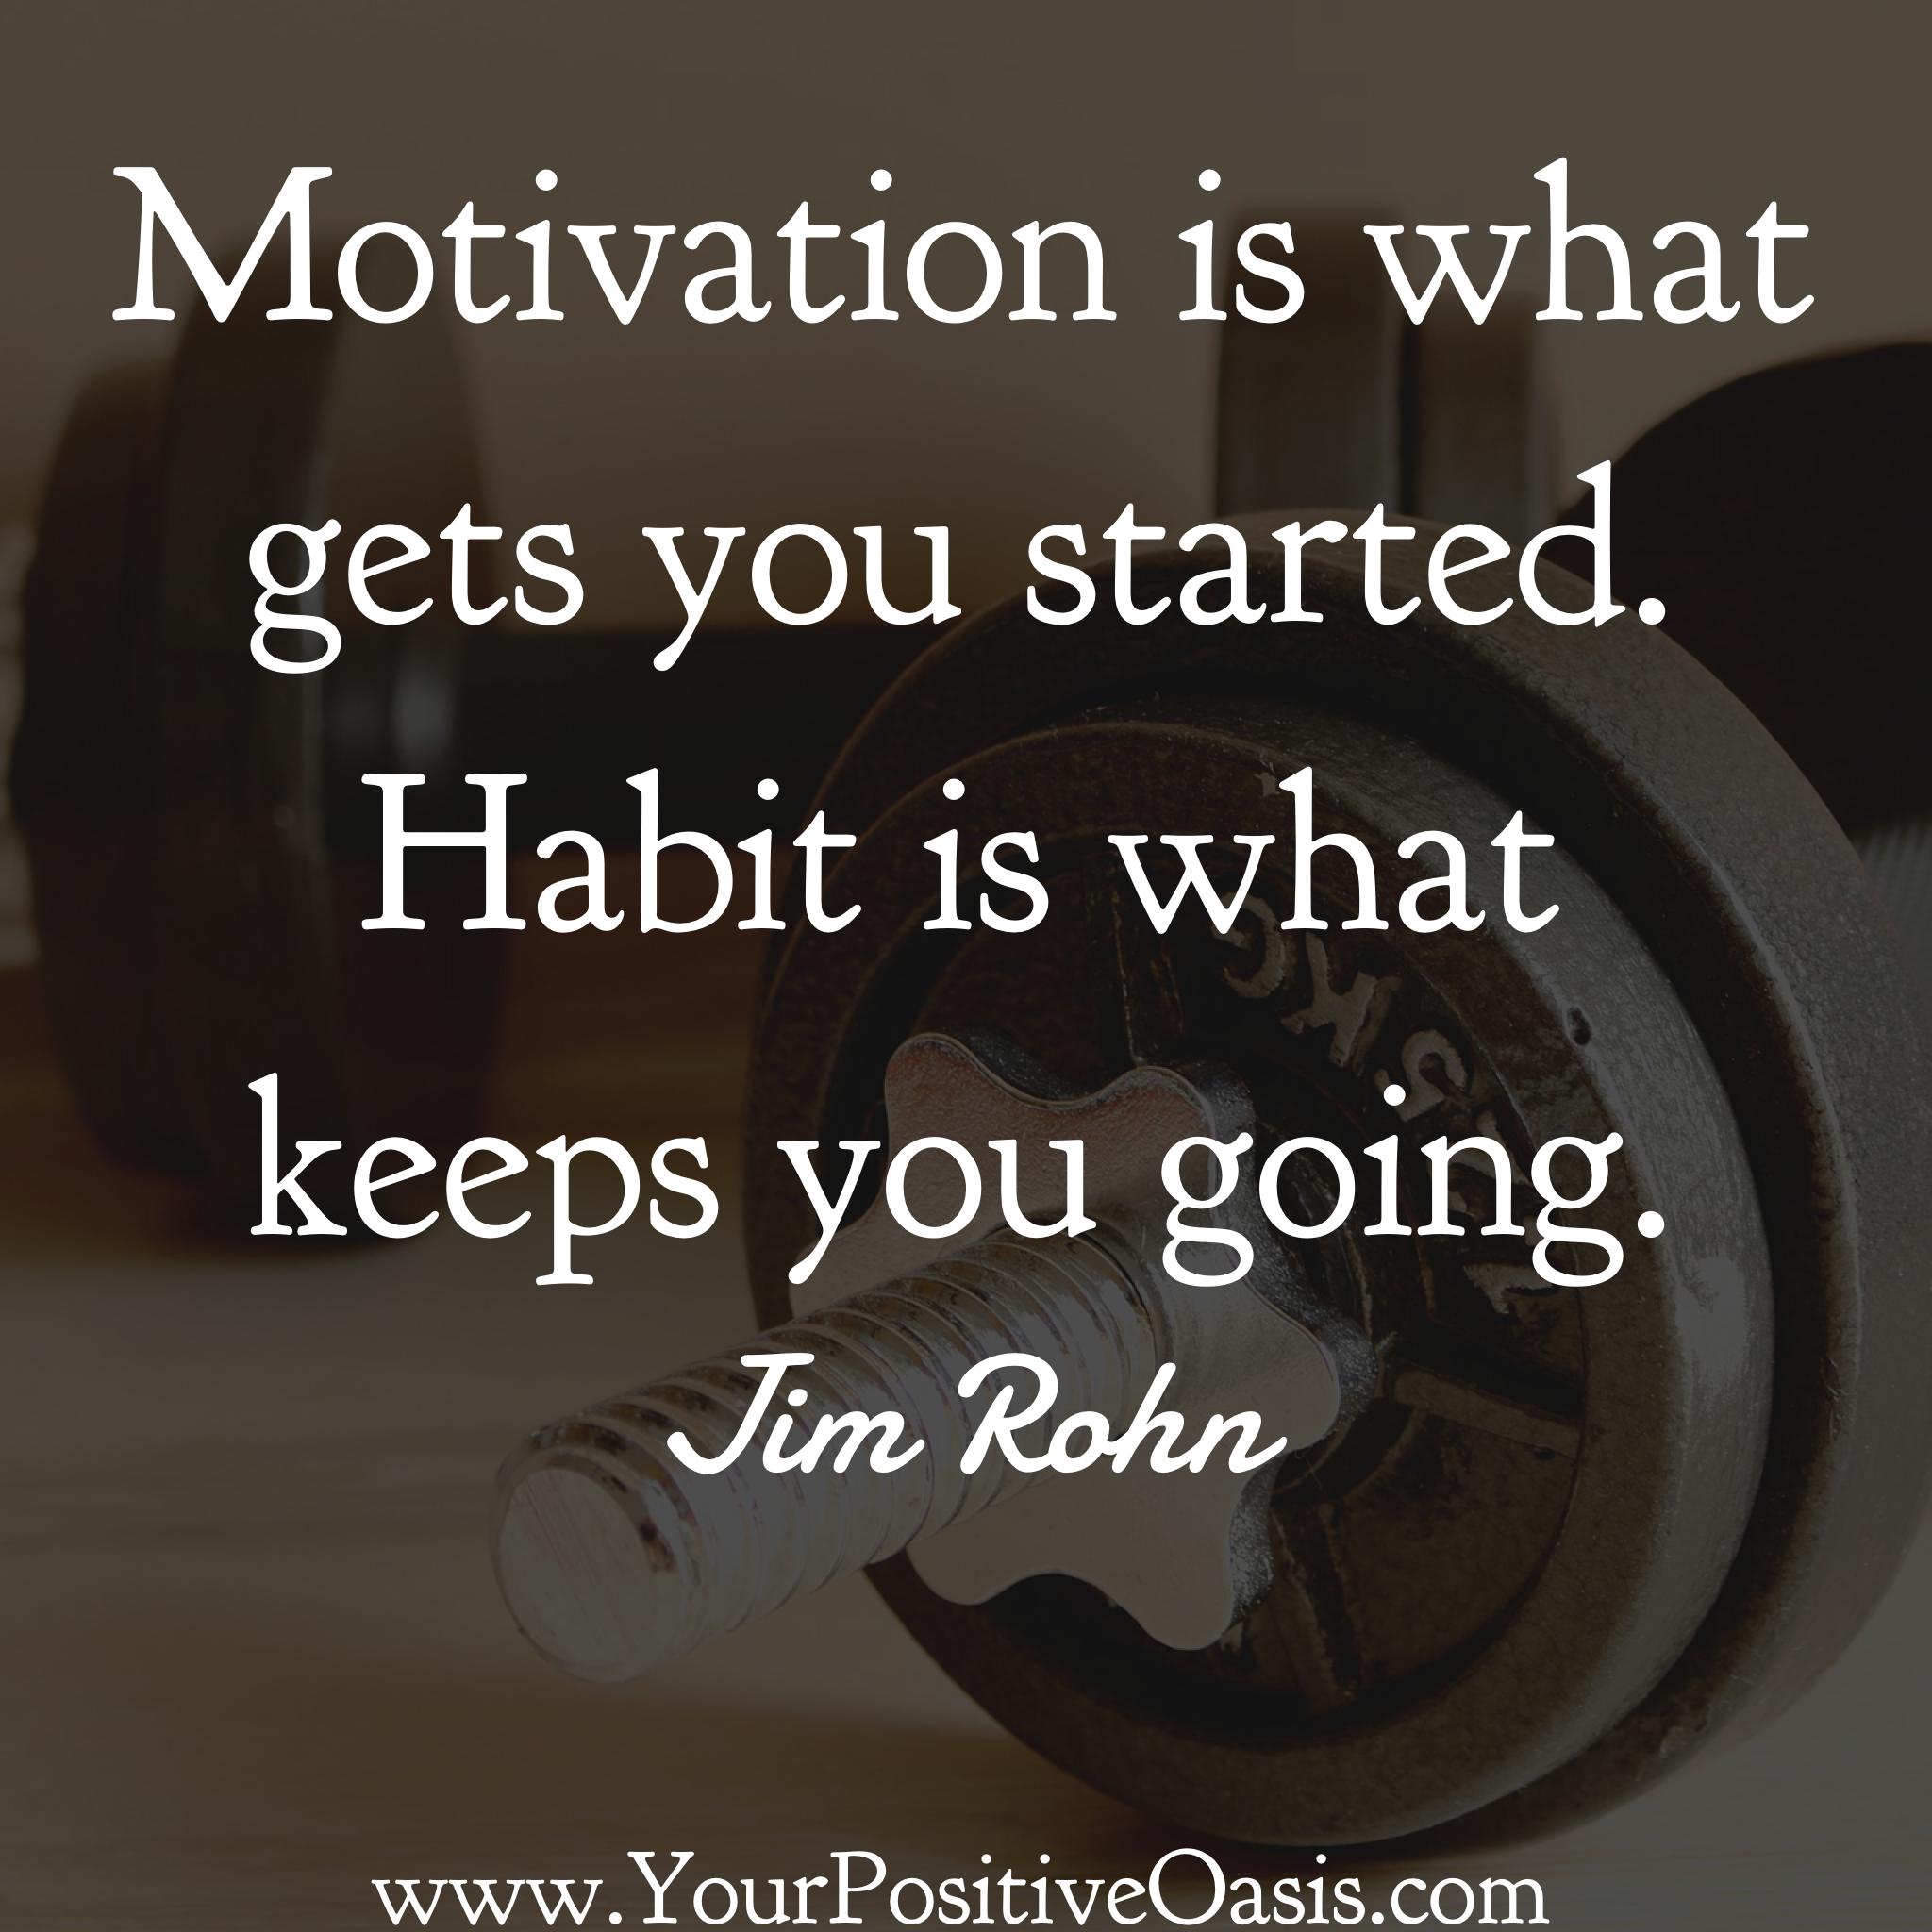 3 Motivational Jim Rohn Quotes  Jim rohn quotes, Inspirational